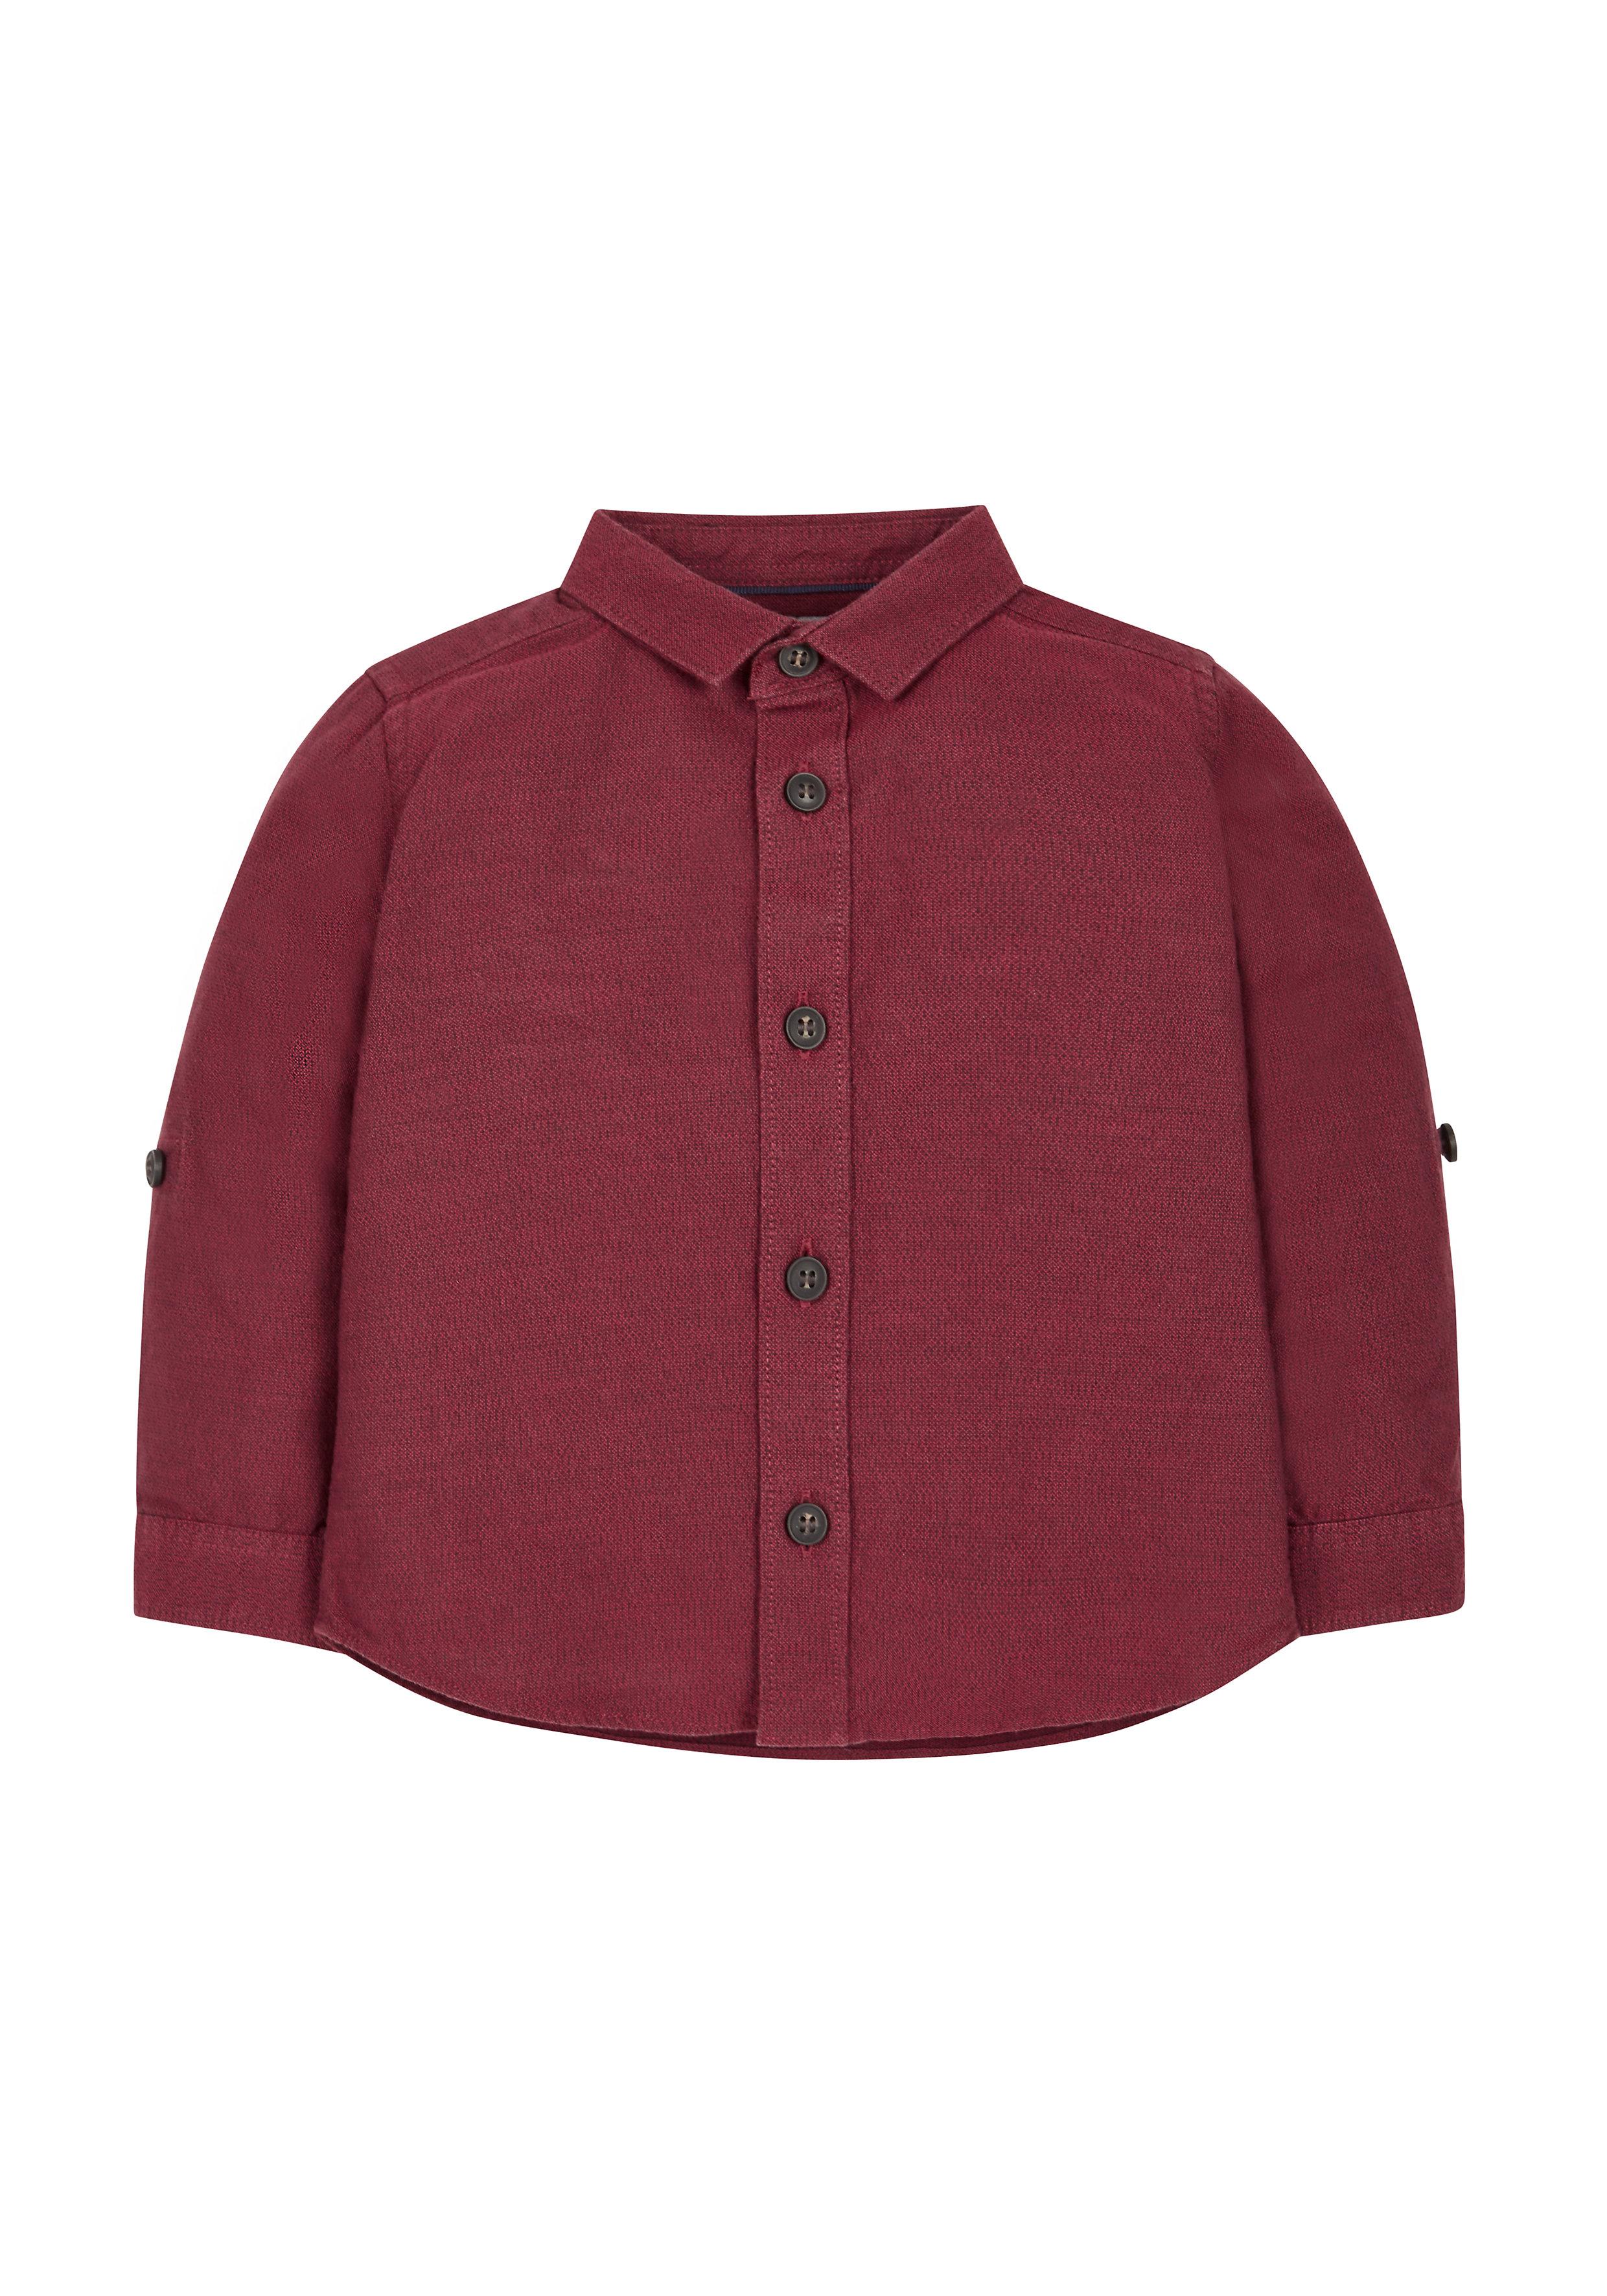 Mothercare | Boys Shirt - Burgundy